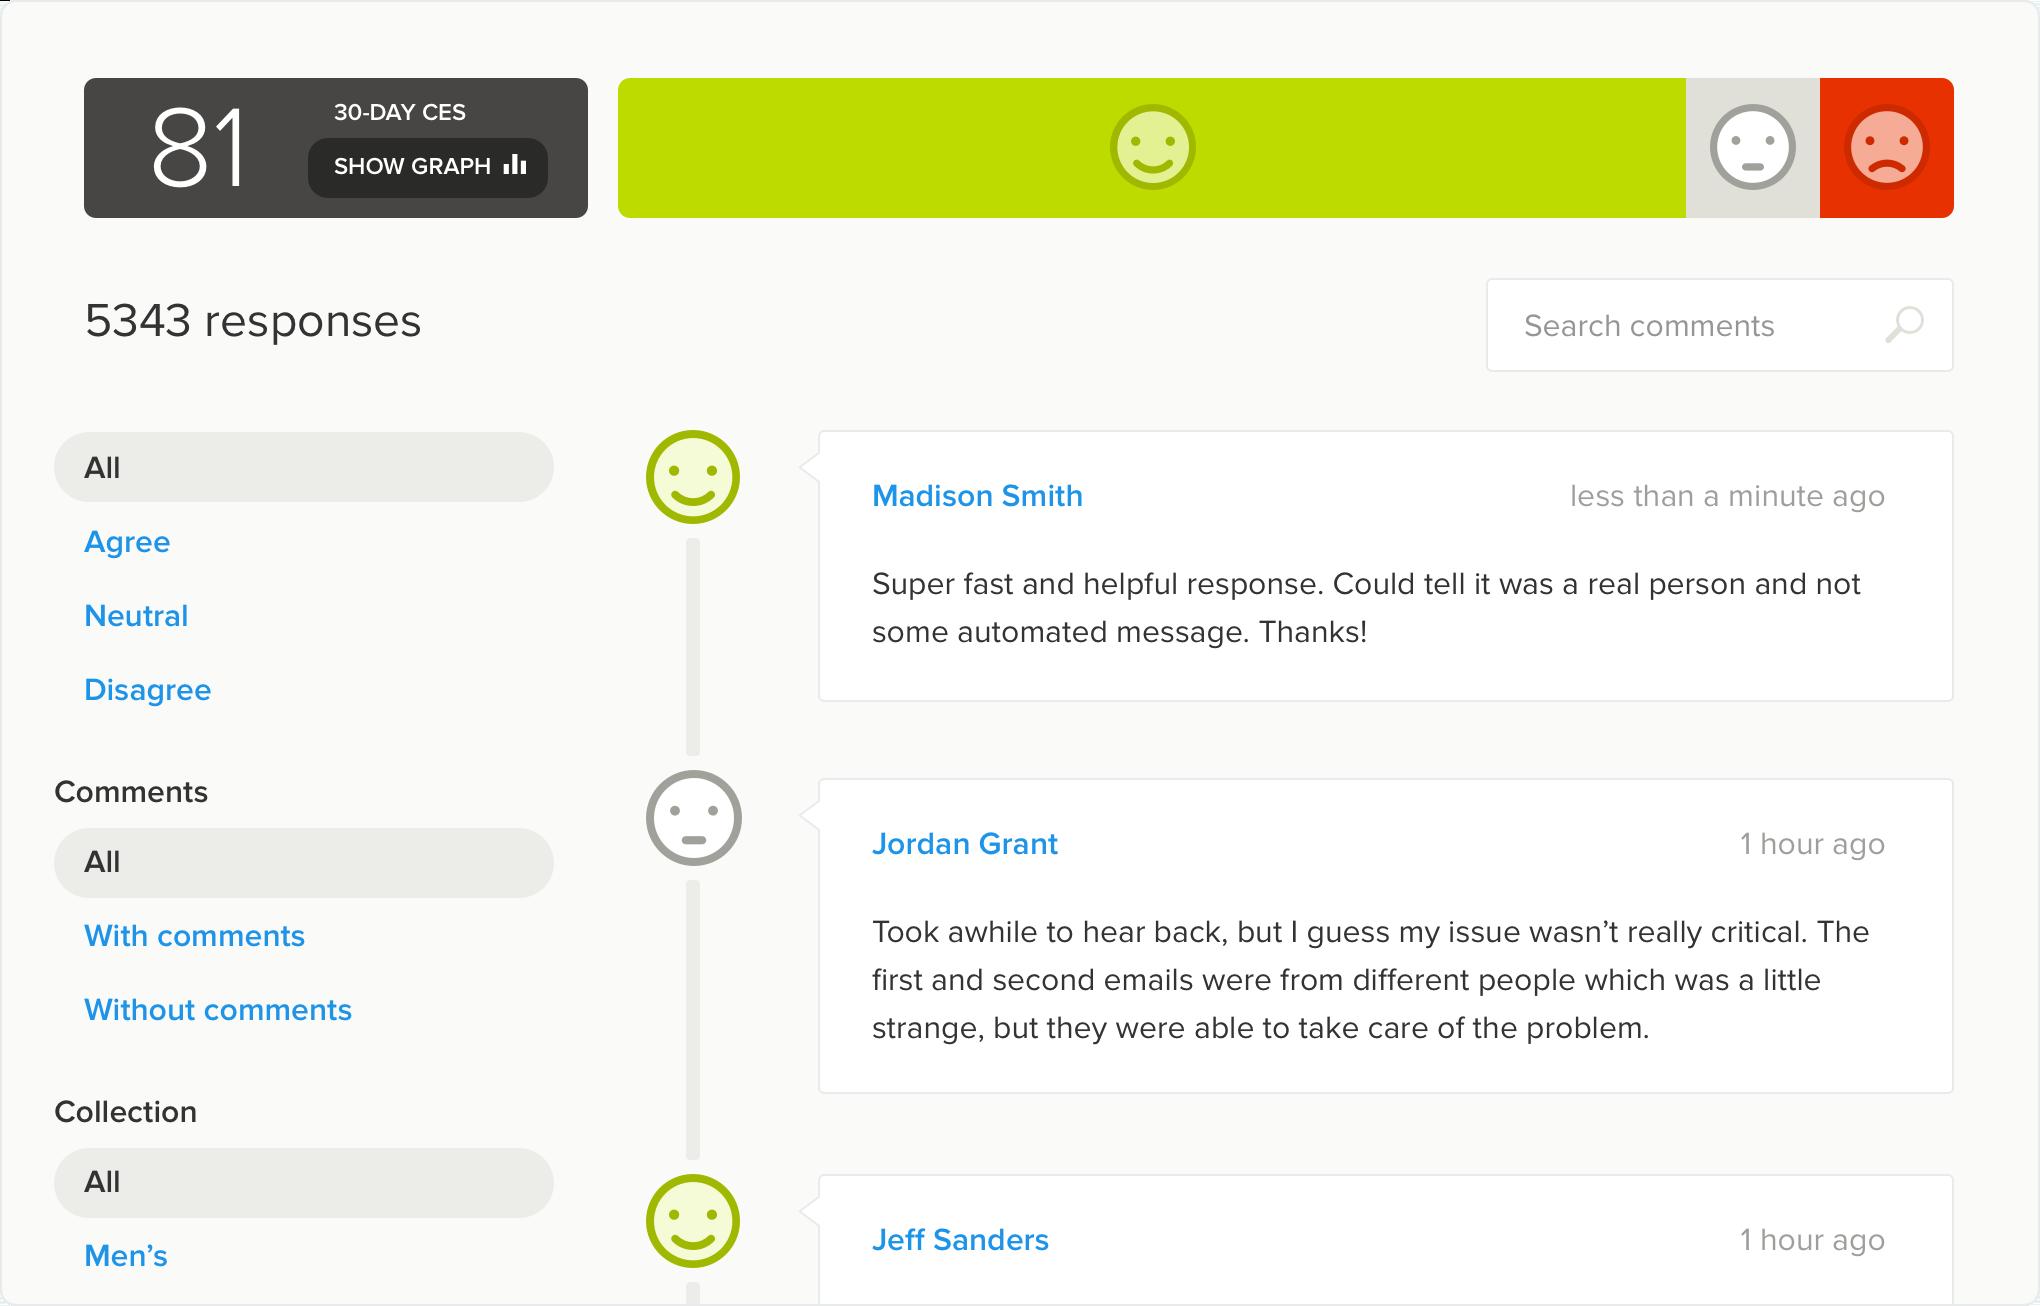 CES survey feedback dashboard